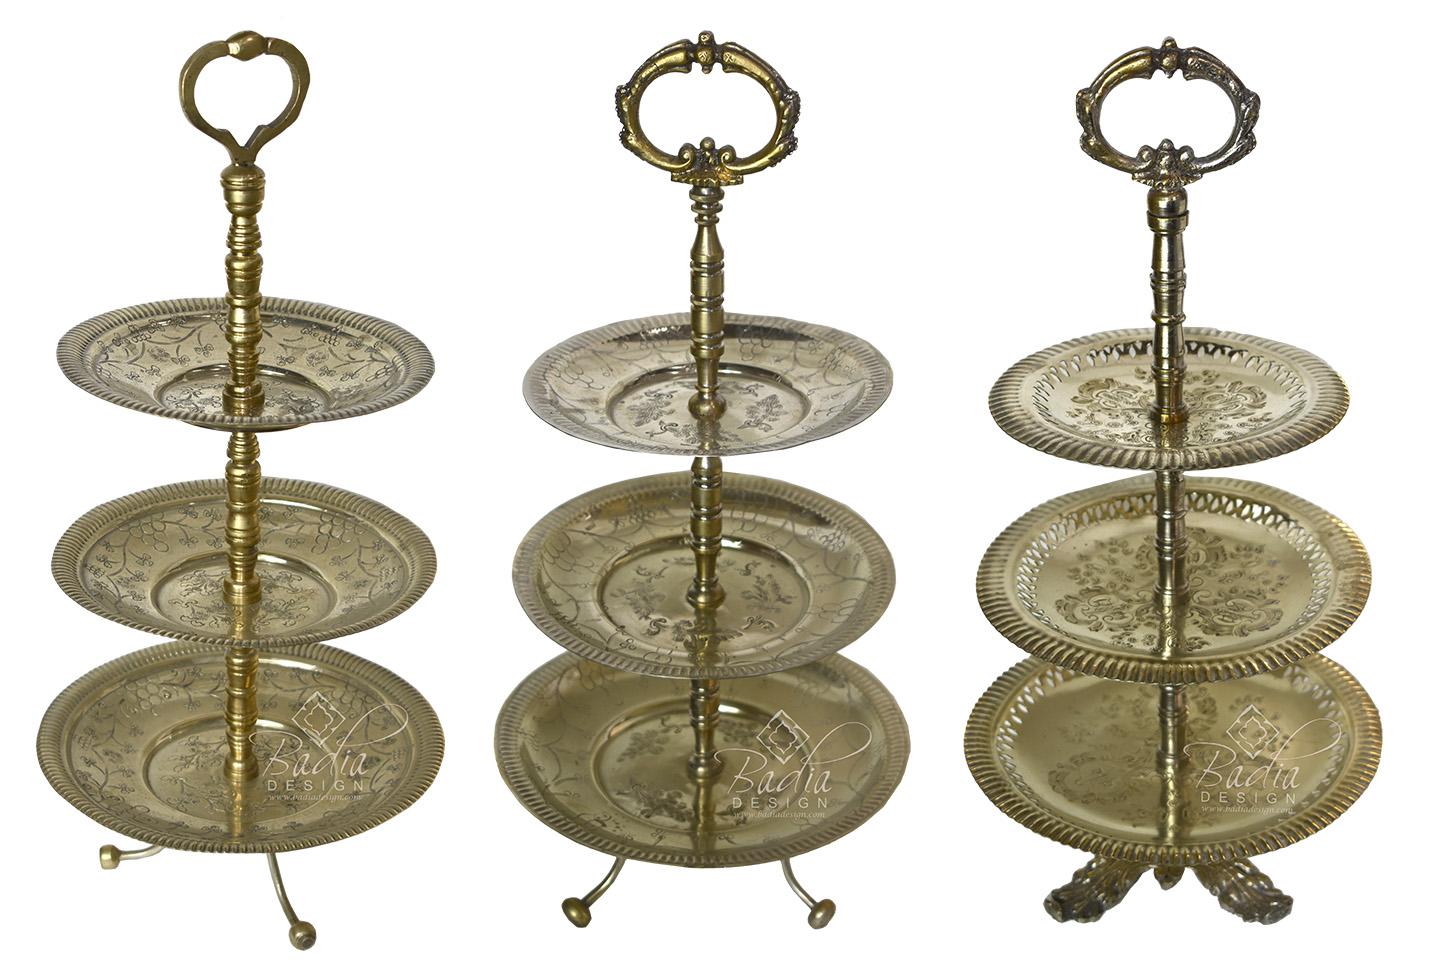 moroccan-three-layer-silver-serving-trays-hd248.jpg